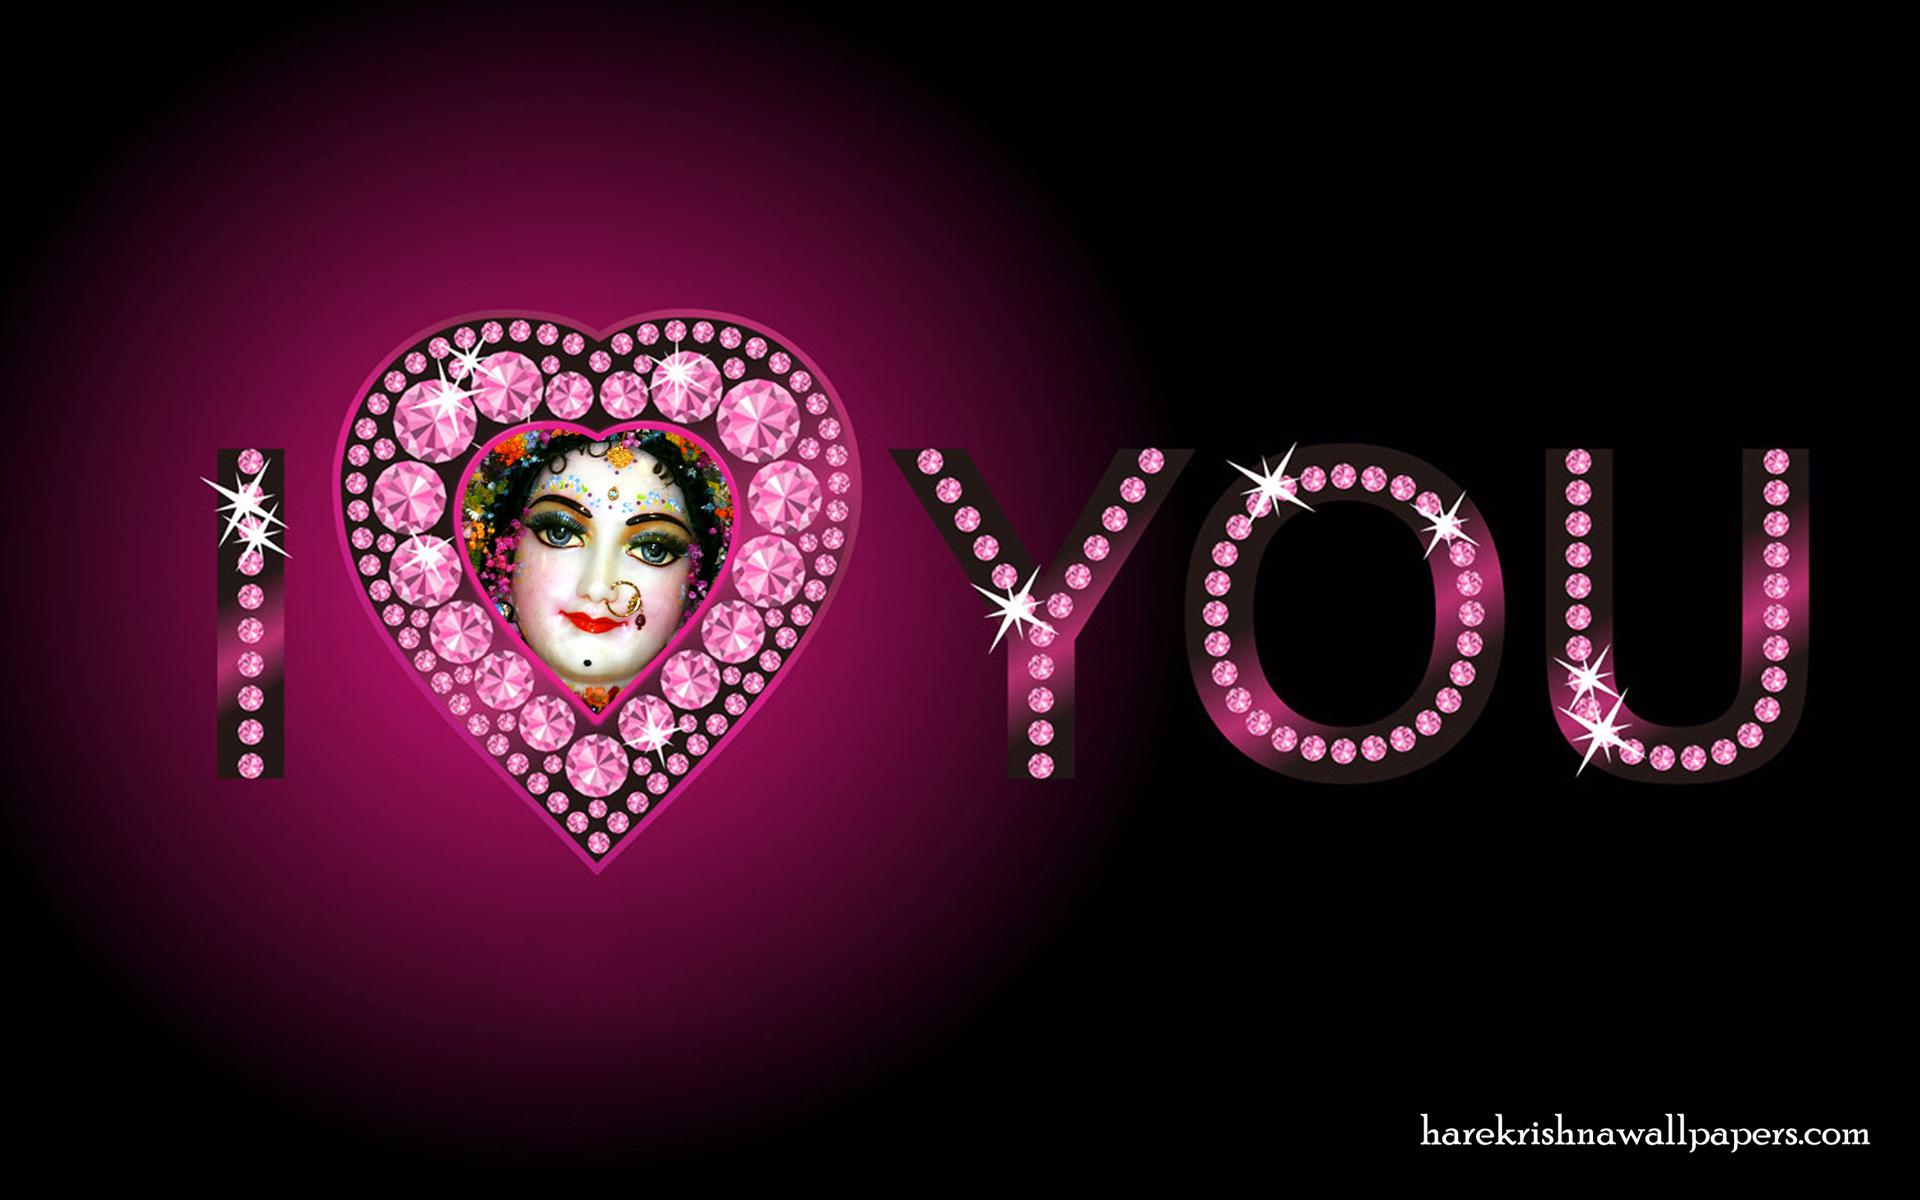 I Love You Radharani Wallpaper (014) Size 1920x1200 Download